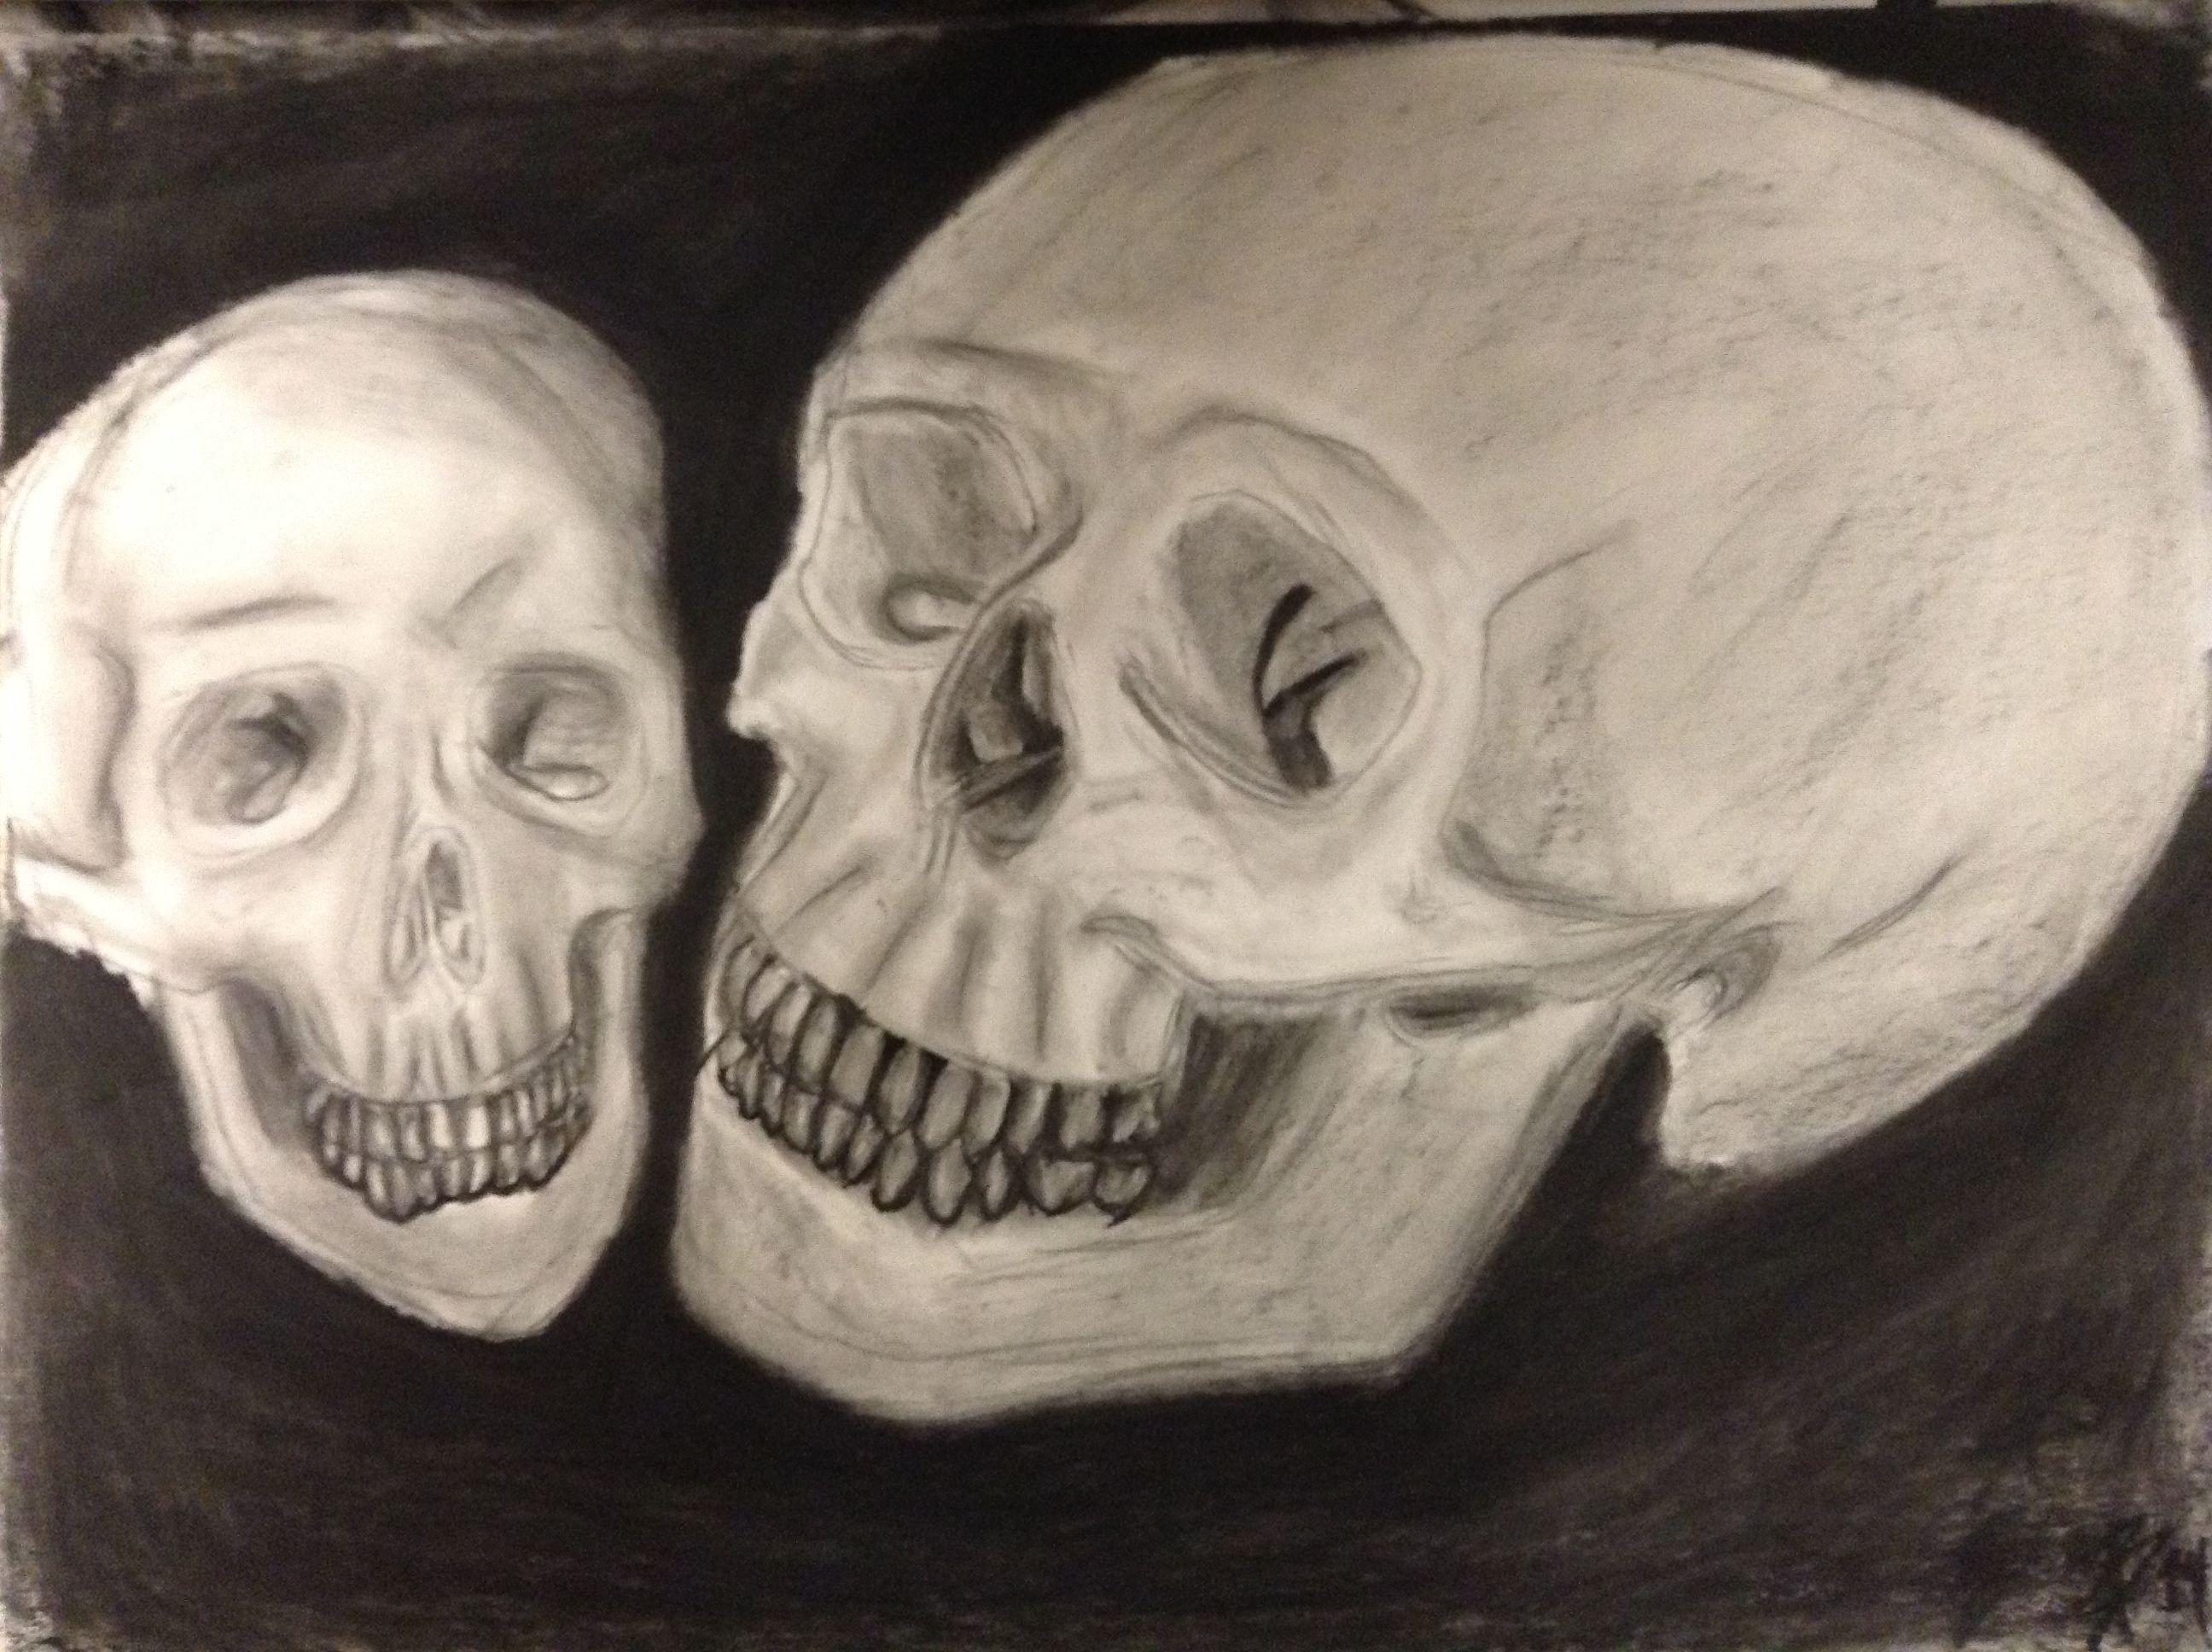 A pair of skulls.